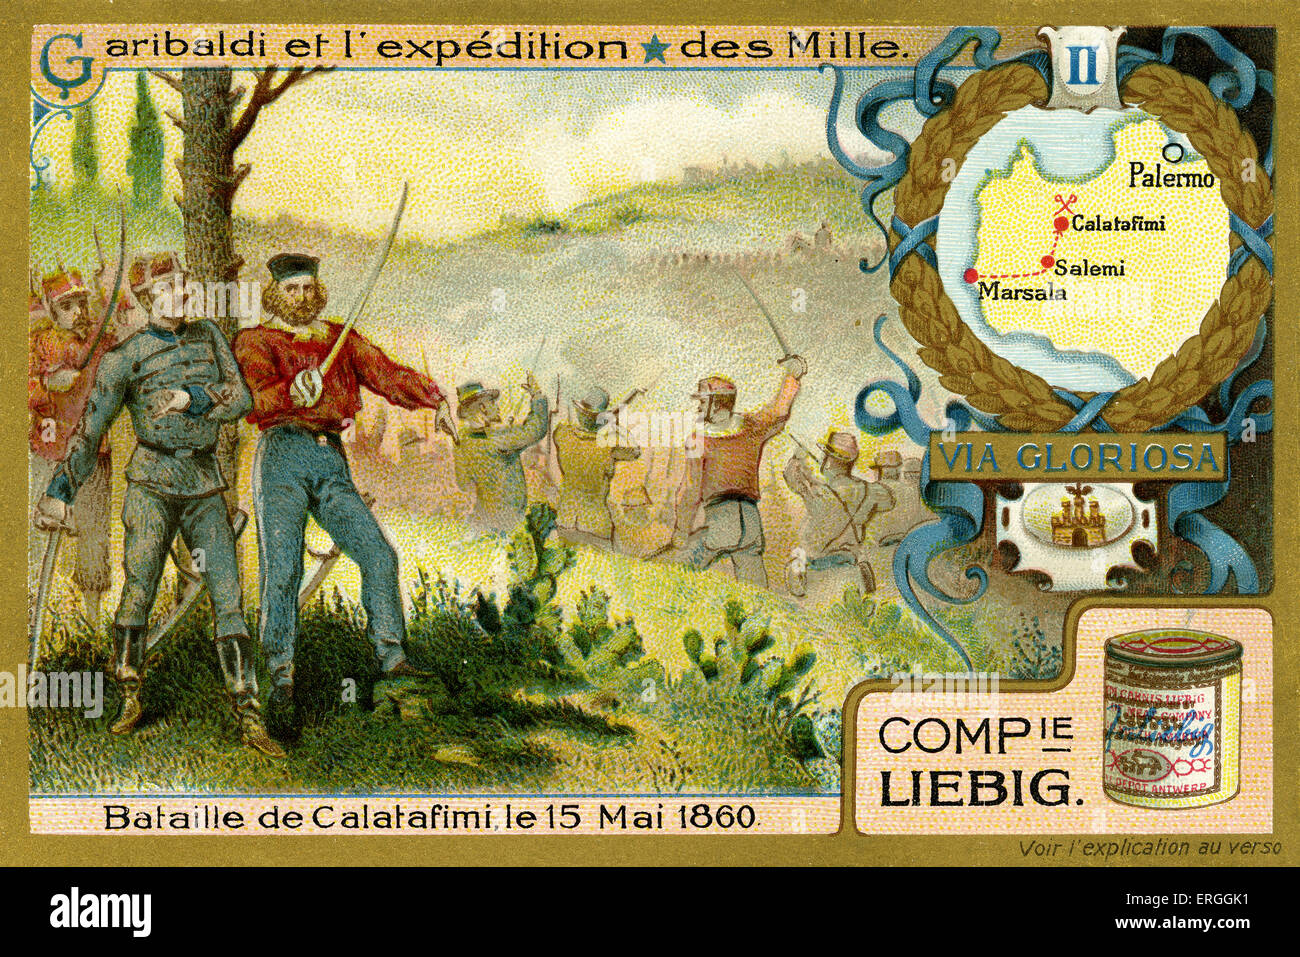 Garibaldi and the Expedition of the Thousand. Illustration of 1910.  Battle of Calatafimi, 15 May 1860. Sicily. - Stock Image